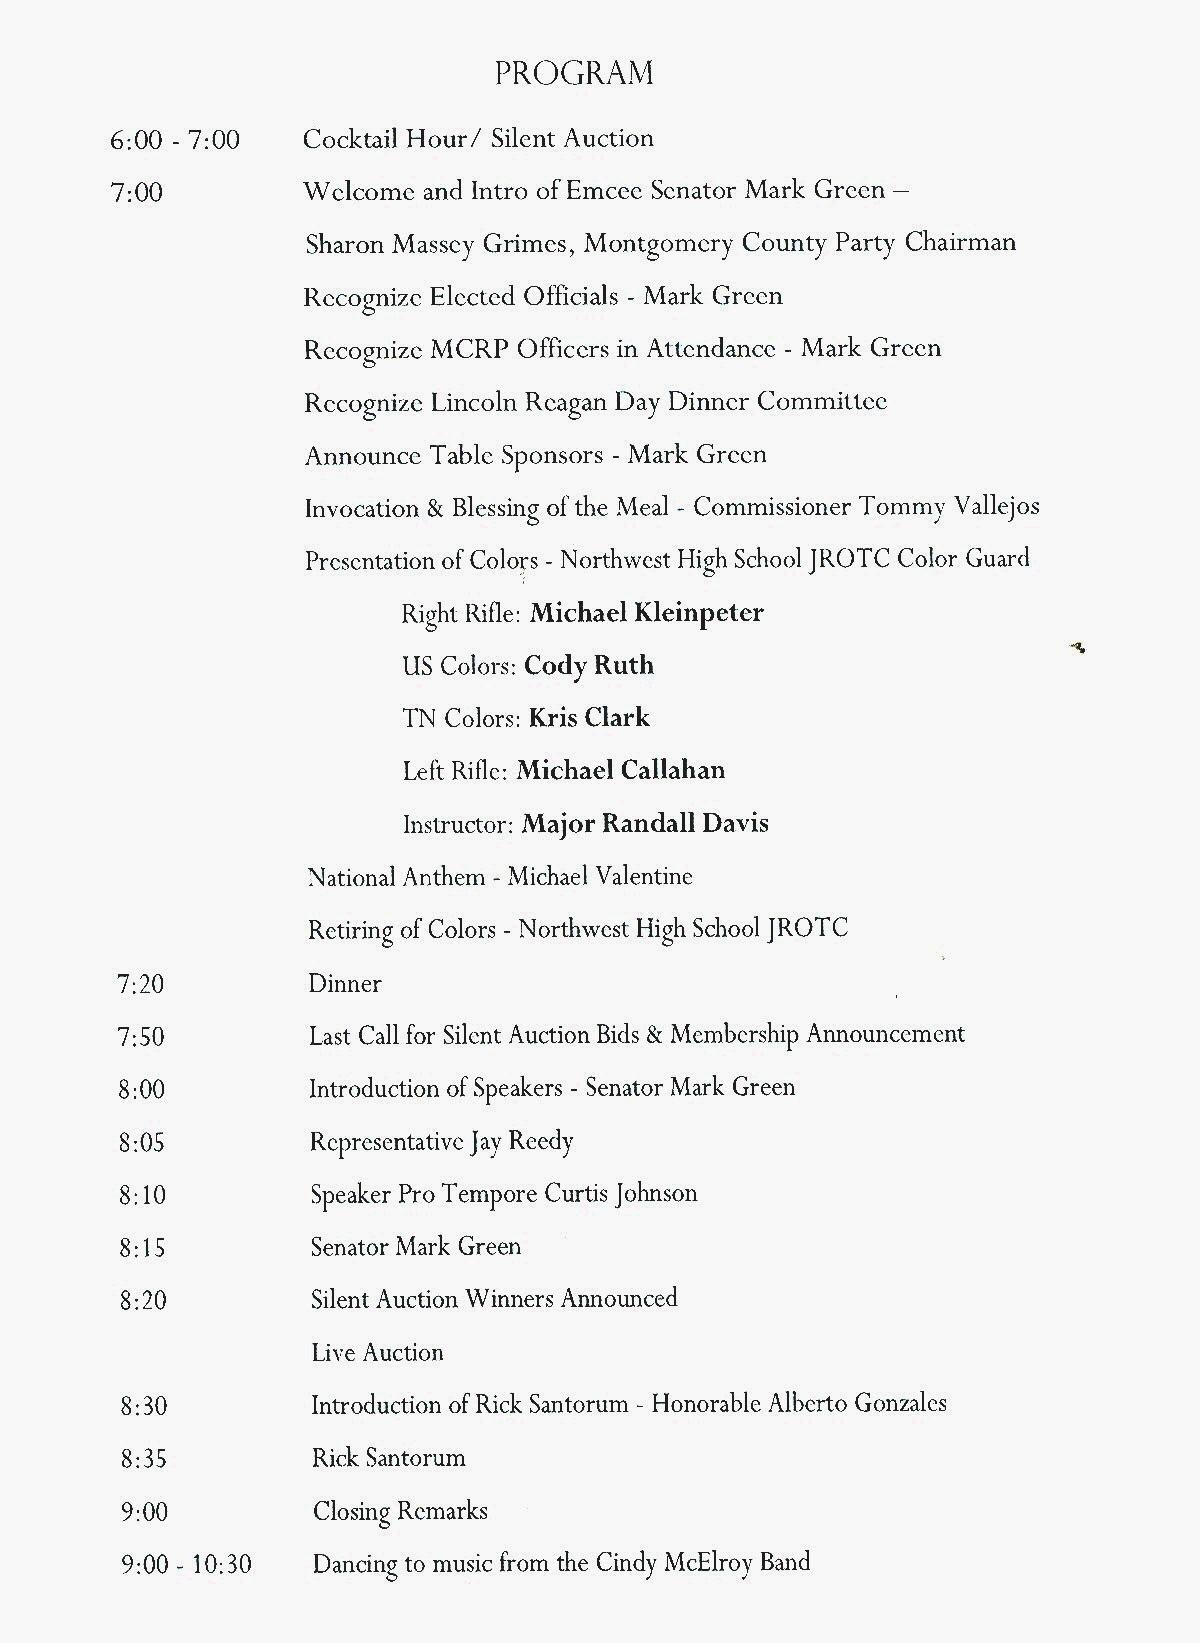 Program page1